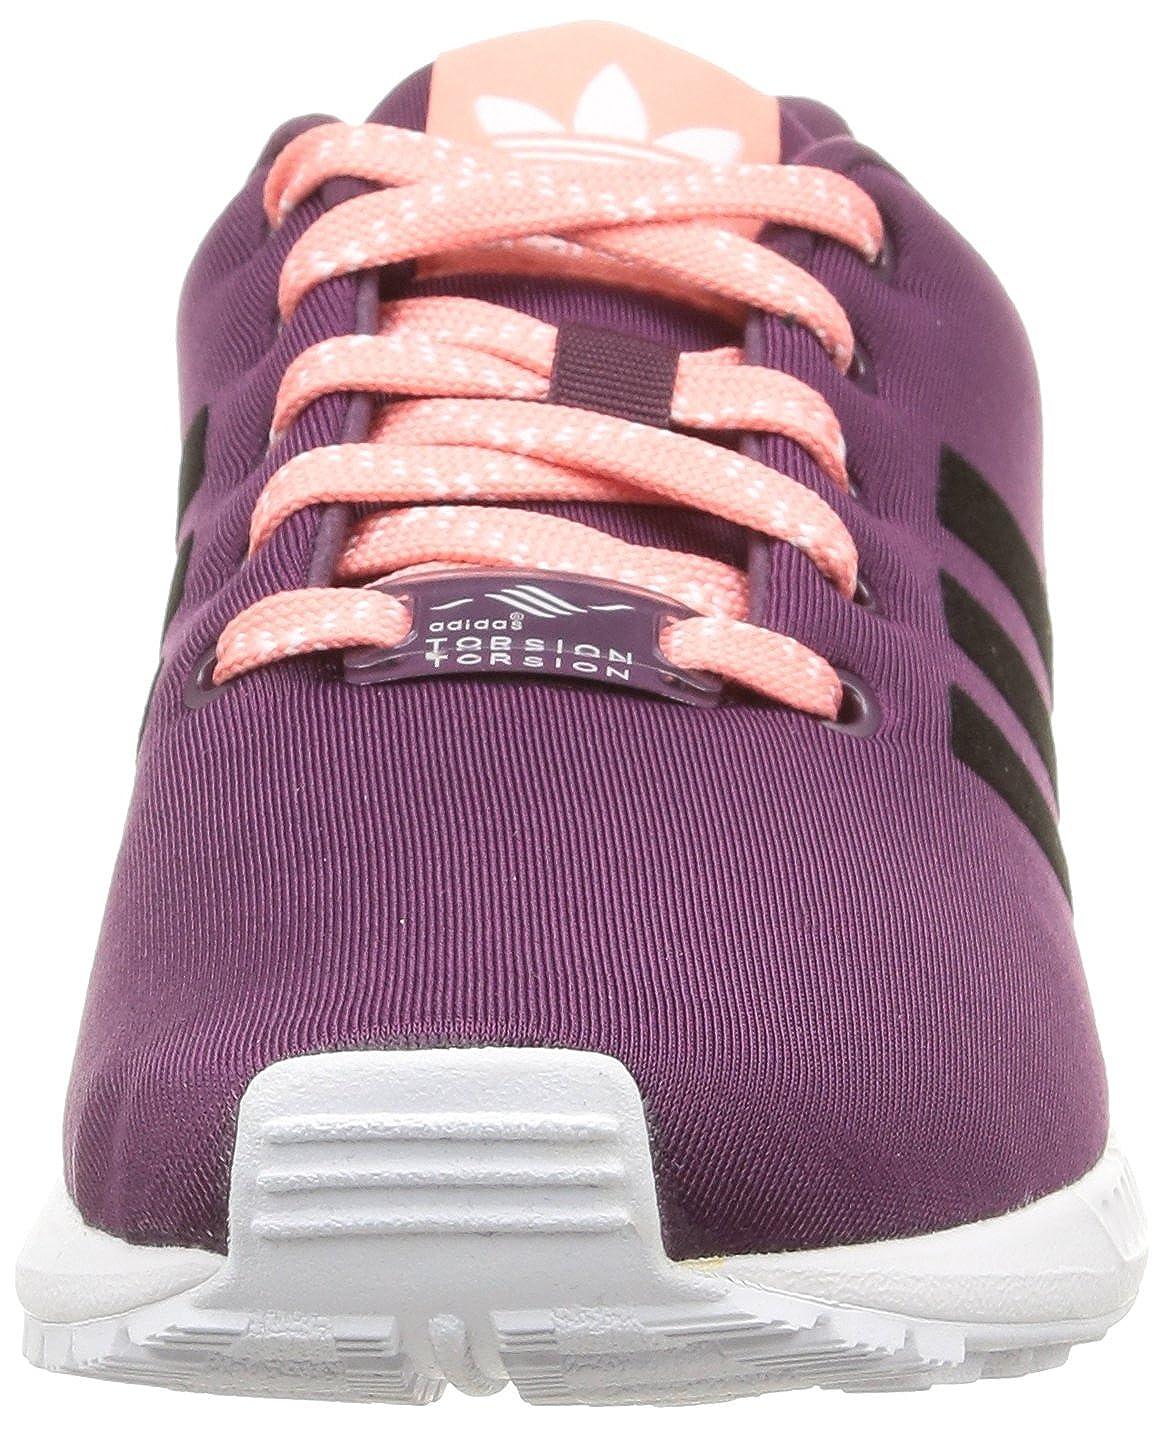 4538dd2a27e10 adidas Women s ZX Flux K Running Shoes Purple Violett (Merlot F15-St Core  Black FTWR White)  Amazon.co.uk  Shoes   Bags